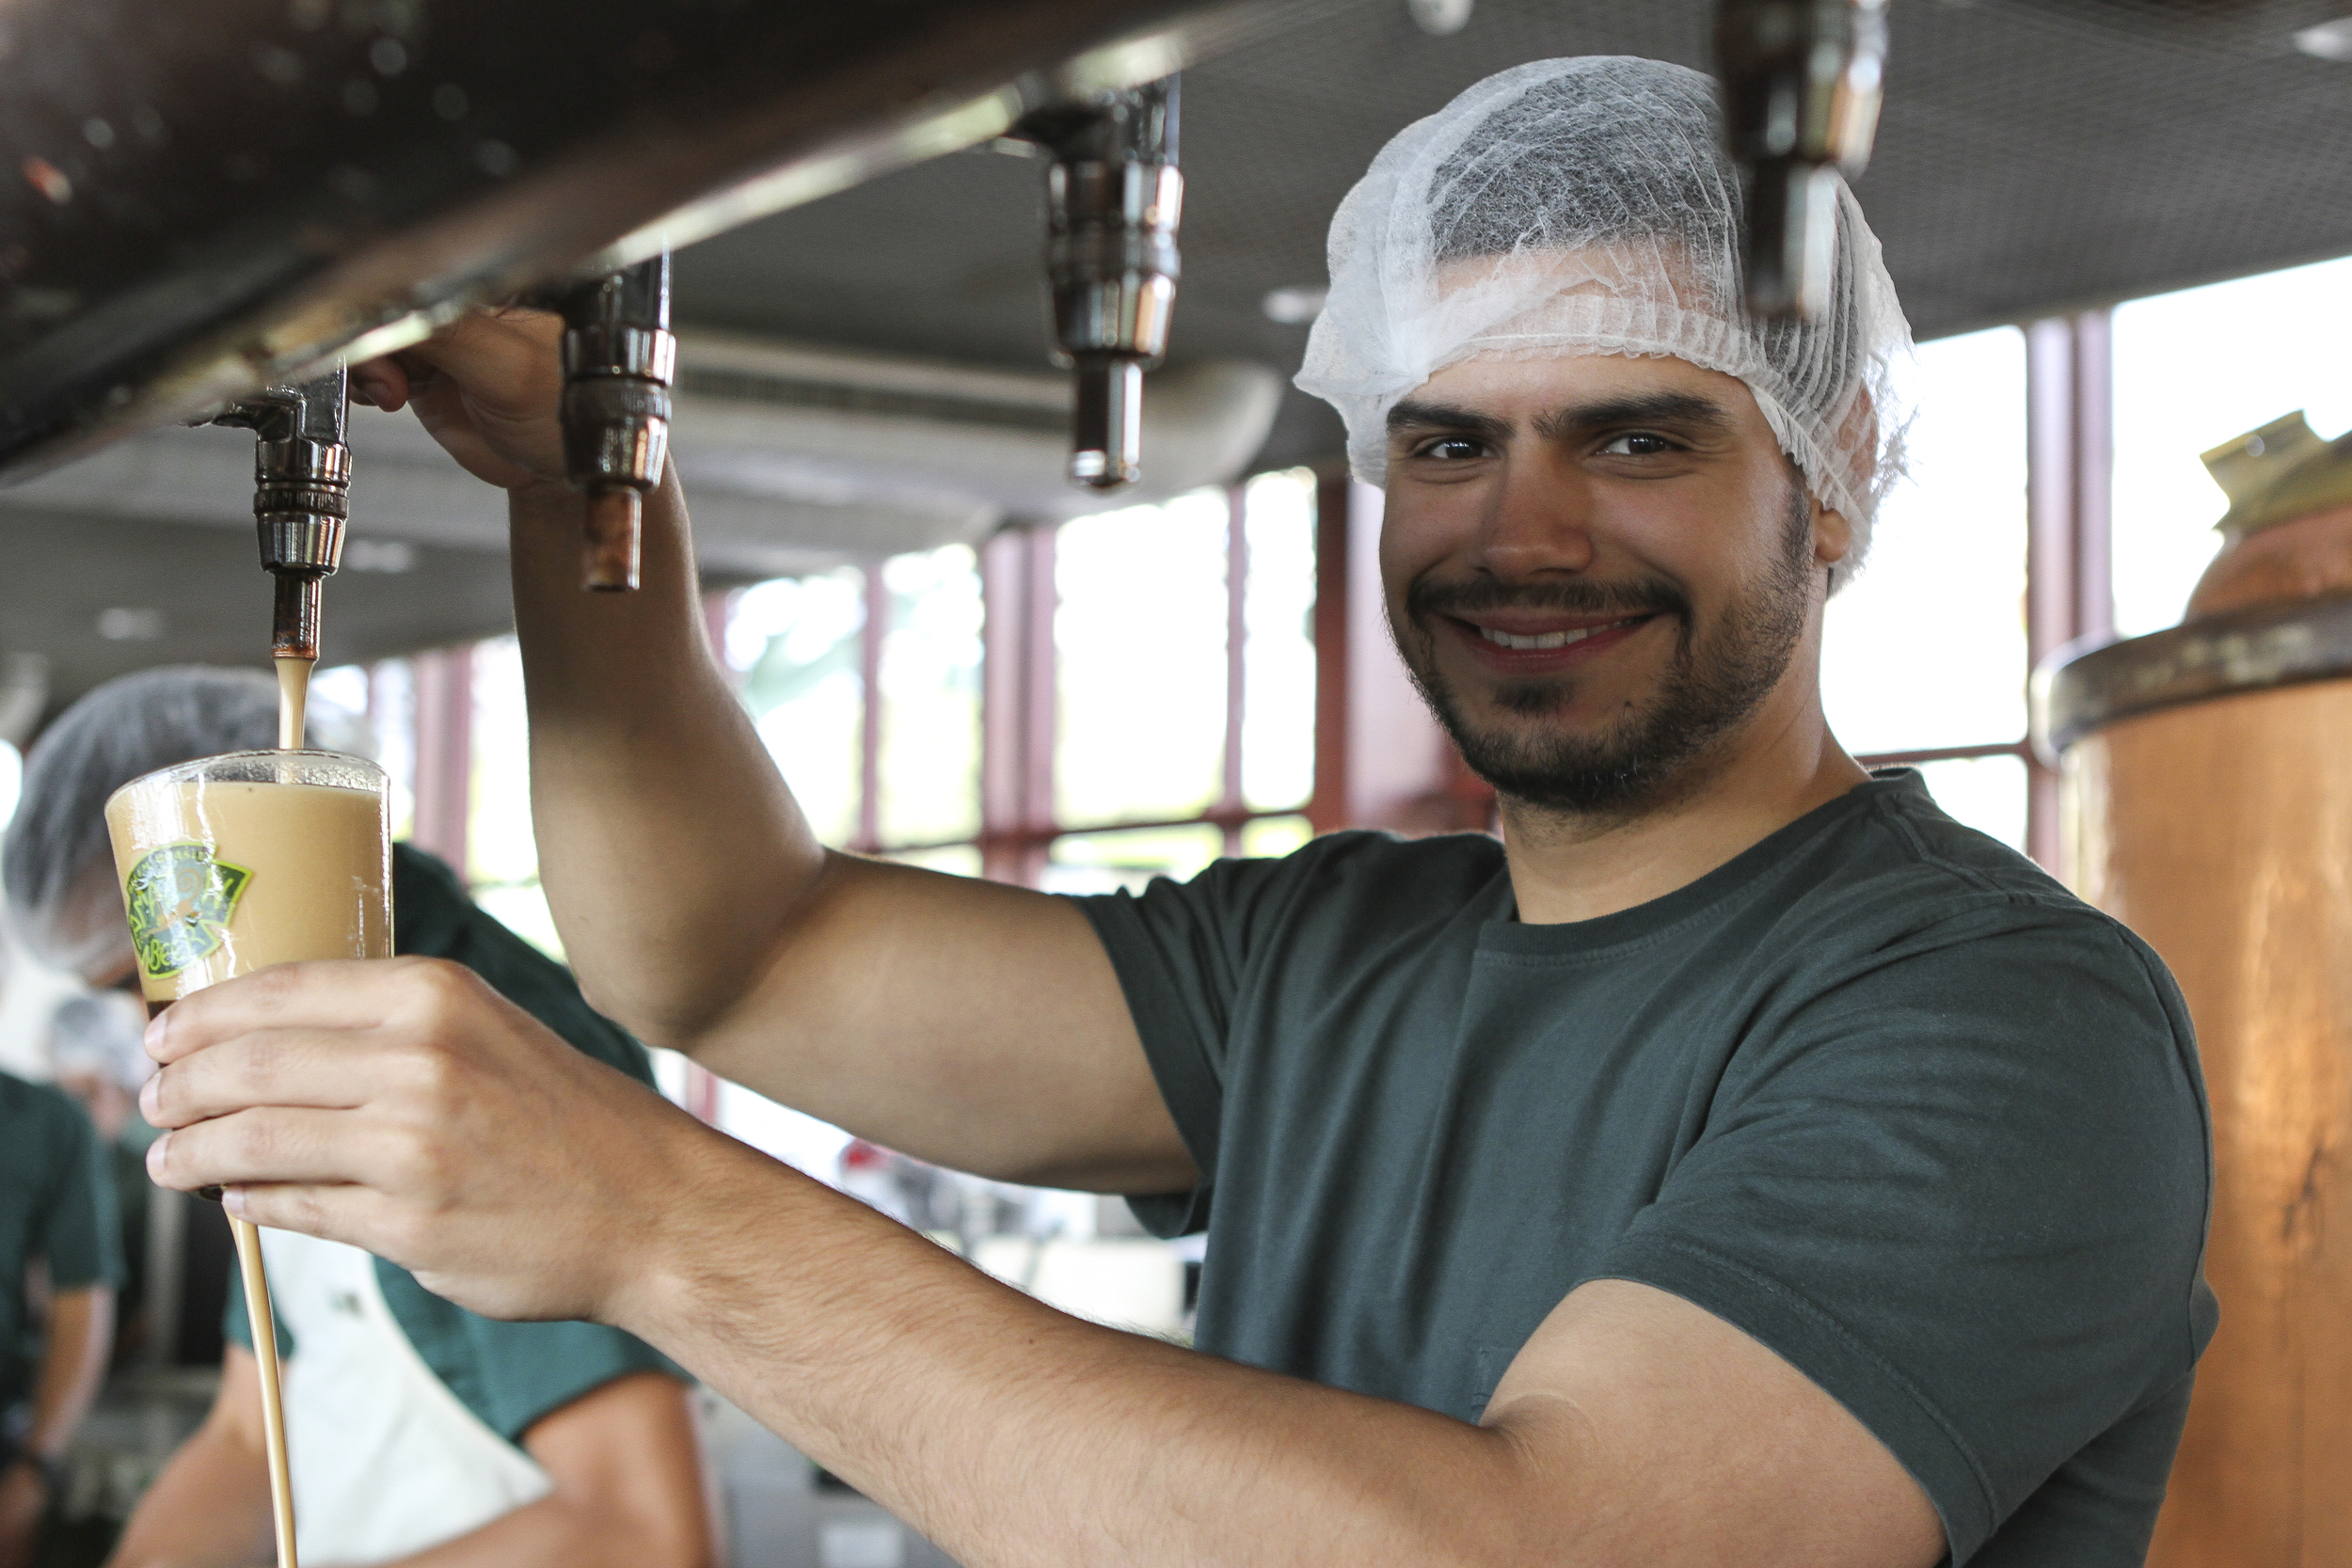 Caio exalta a visão empreendedora de seu pai (Foto: Juliana Spinola/Especial para a Beer Art)